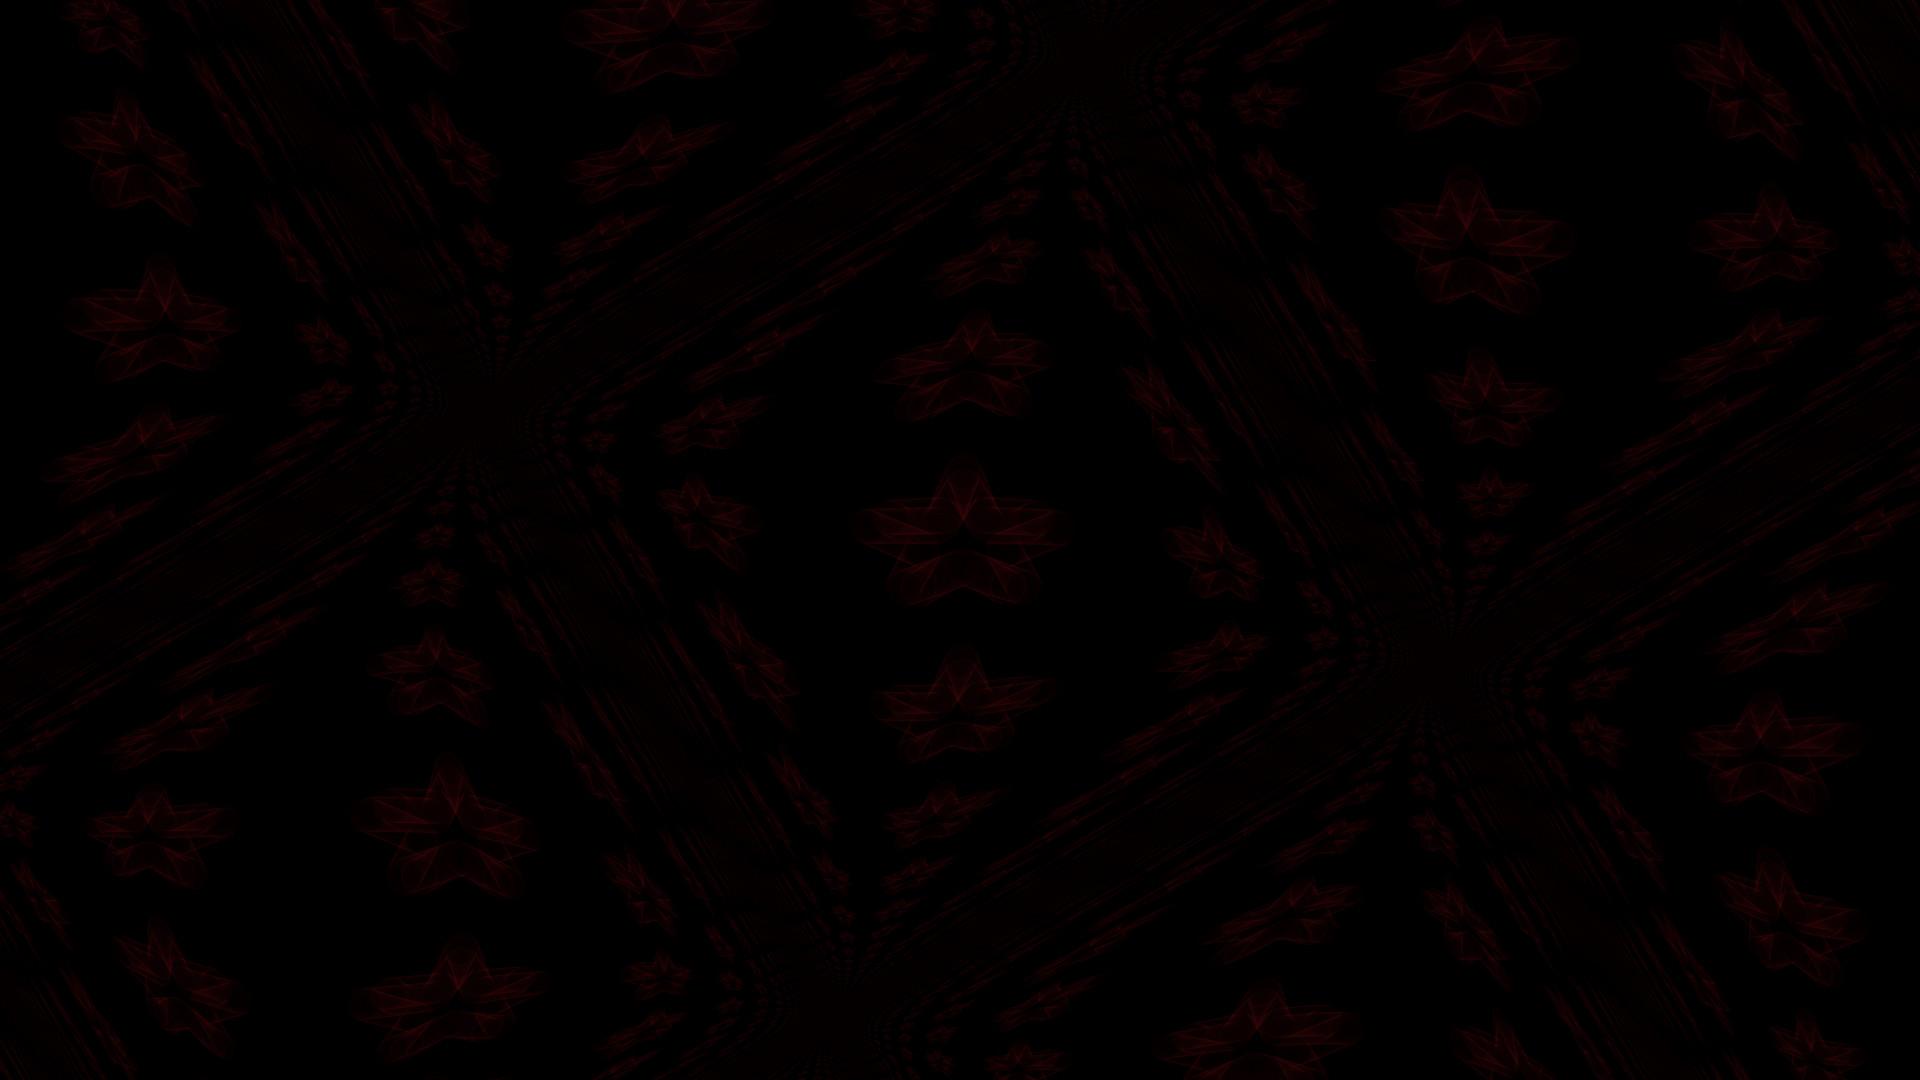 1920x1080 Cool Black And Red Wallpaper Keysinspectorinc.com